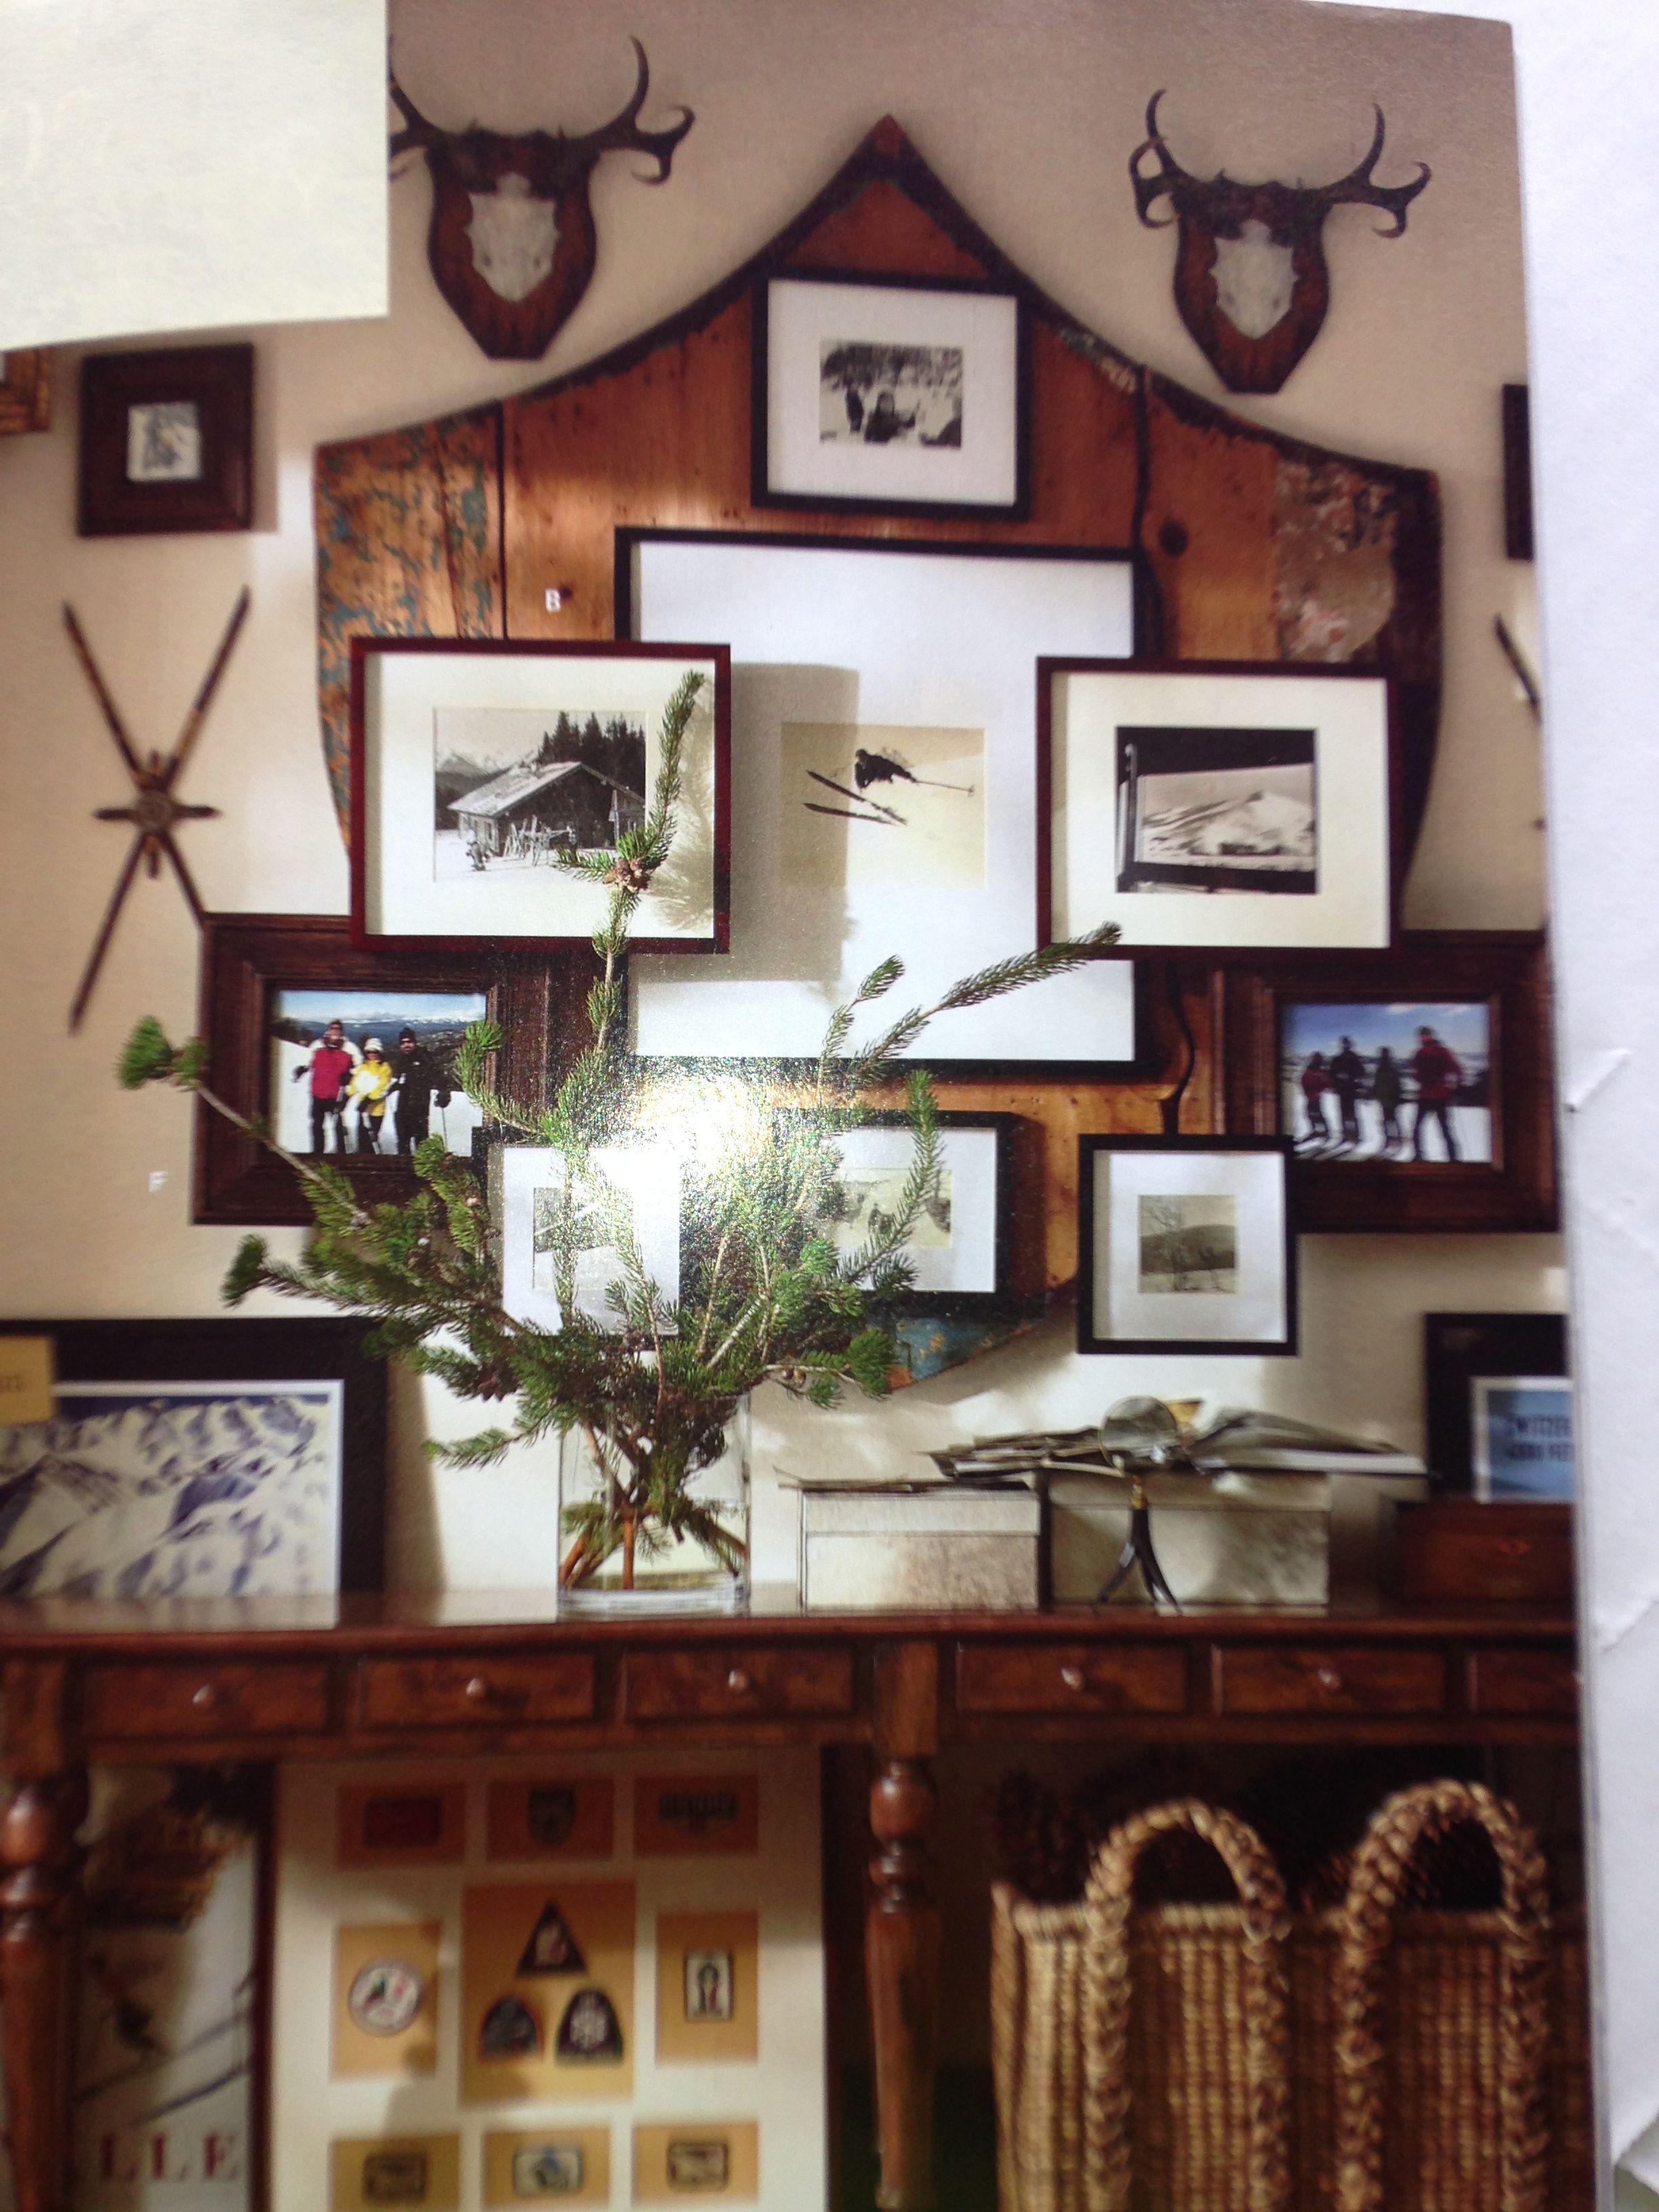 Cabin Wall Collage Lodge Decor Ski Lodge Decor Wood Gallery Frames